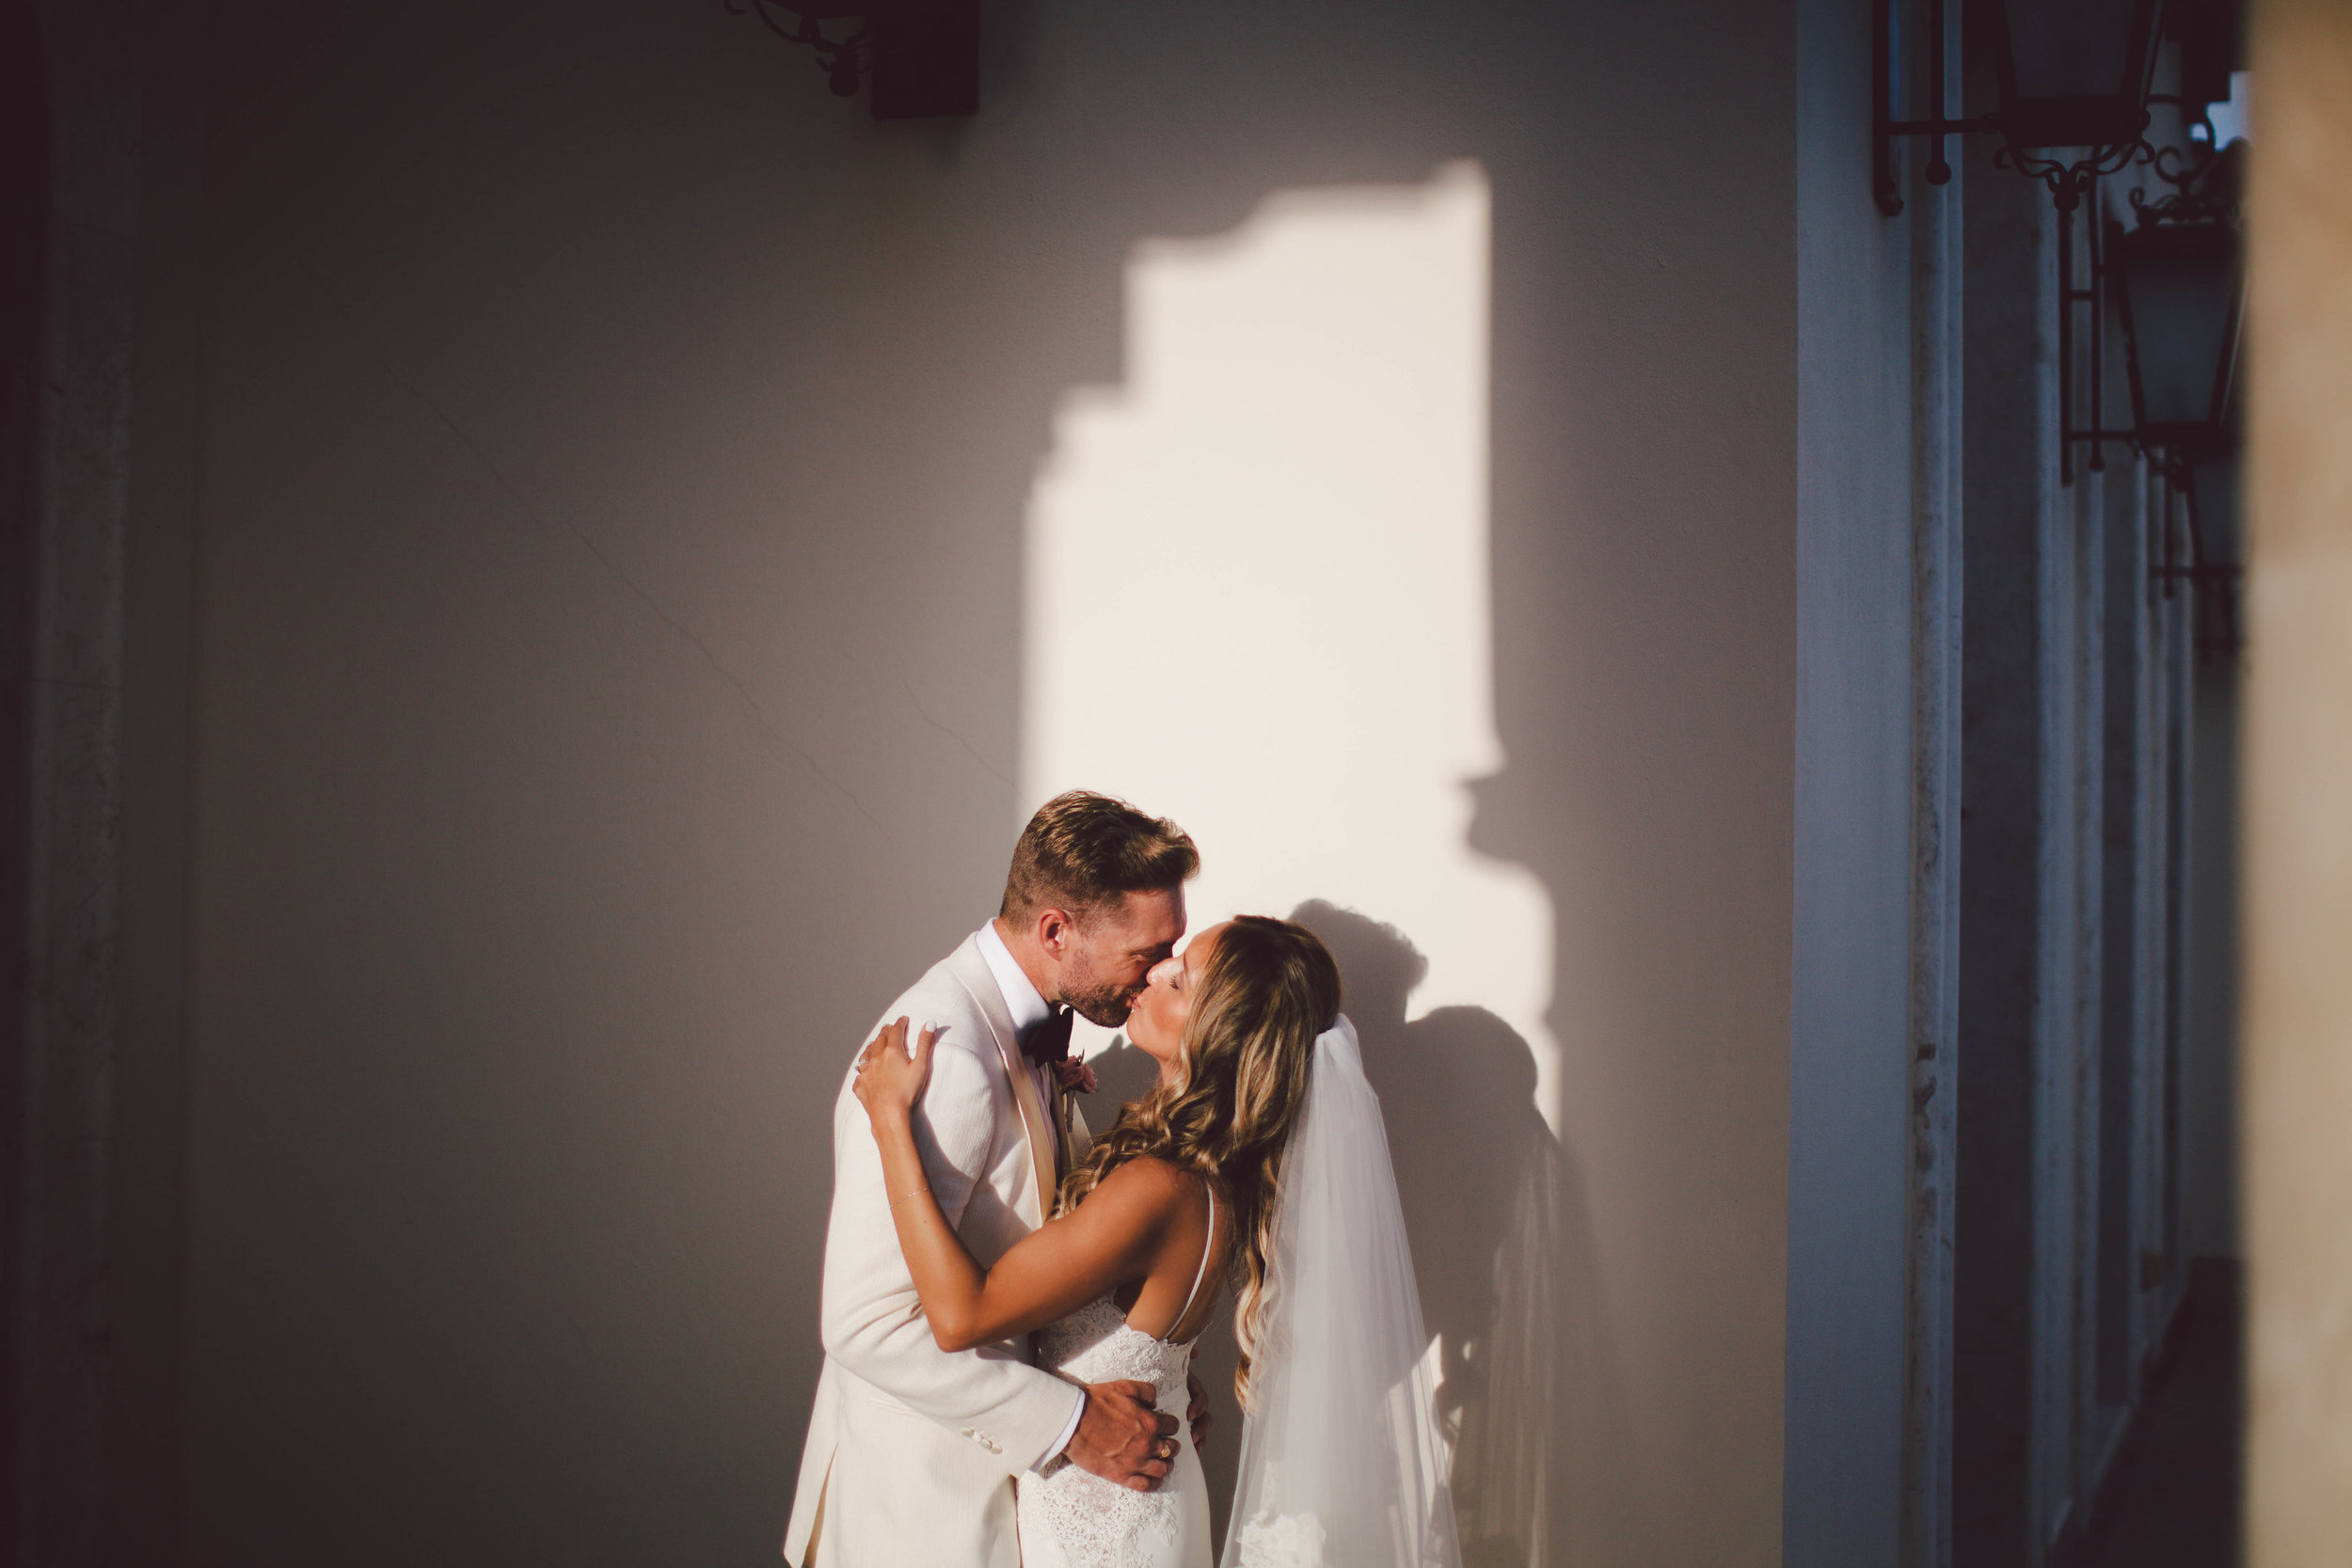 mexico_wedding_cancun_villa_la_joya_evangeline_lane_094.jpg